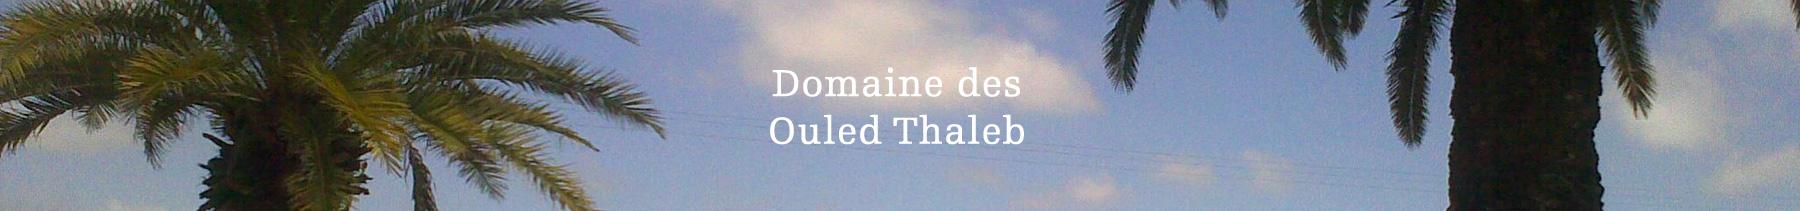 Domaine des Ouled Thaleb